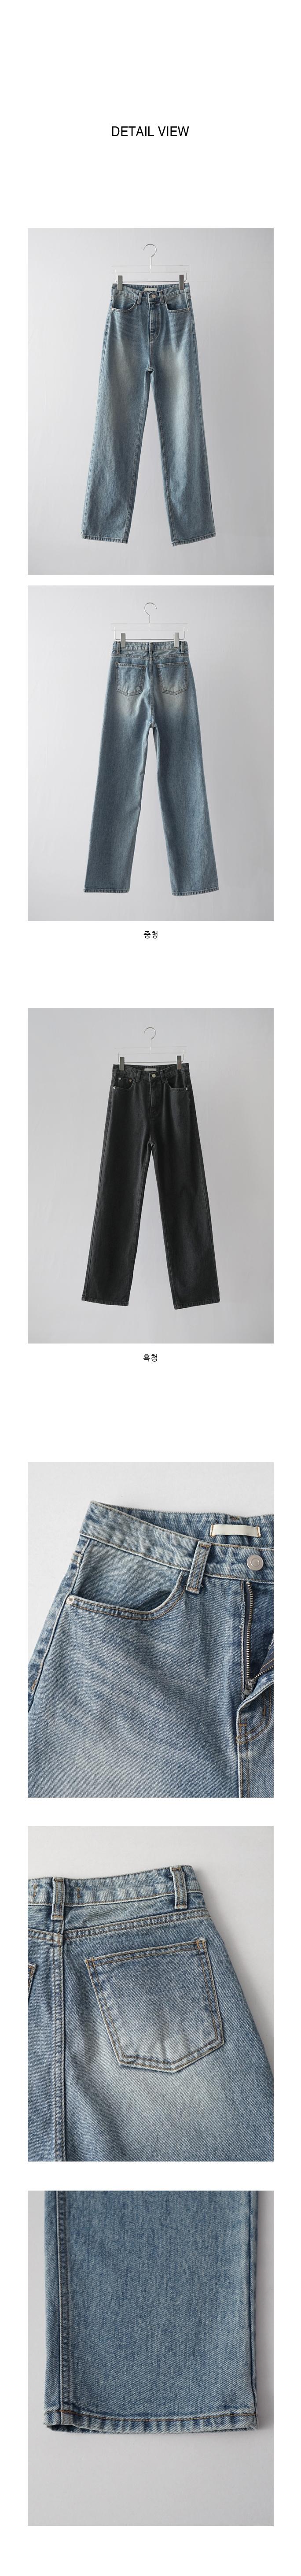 cool steady denim pants